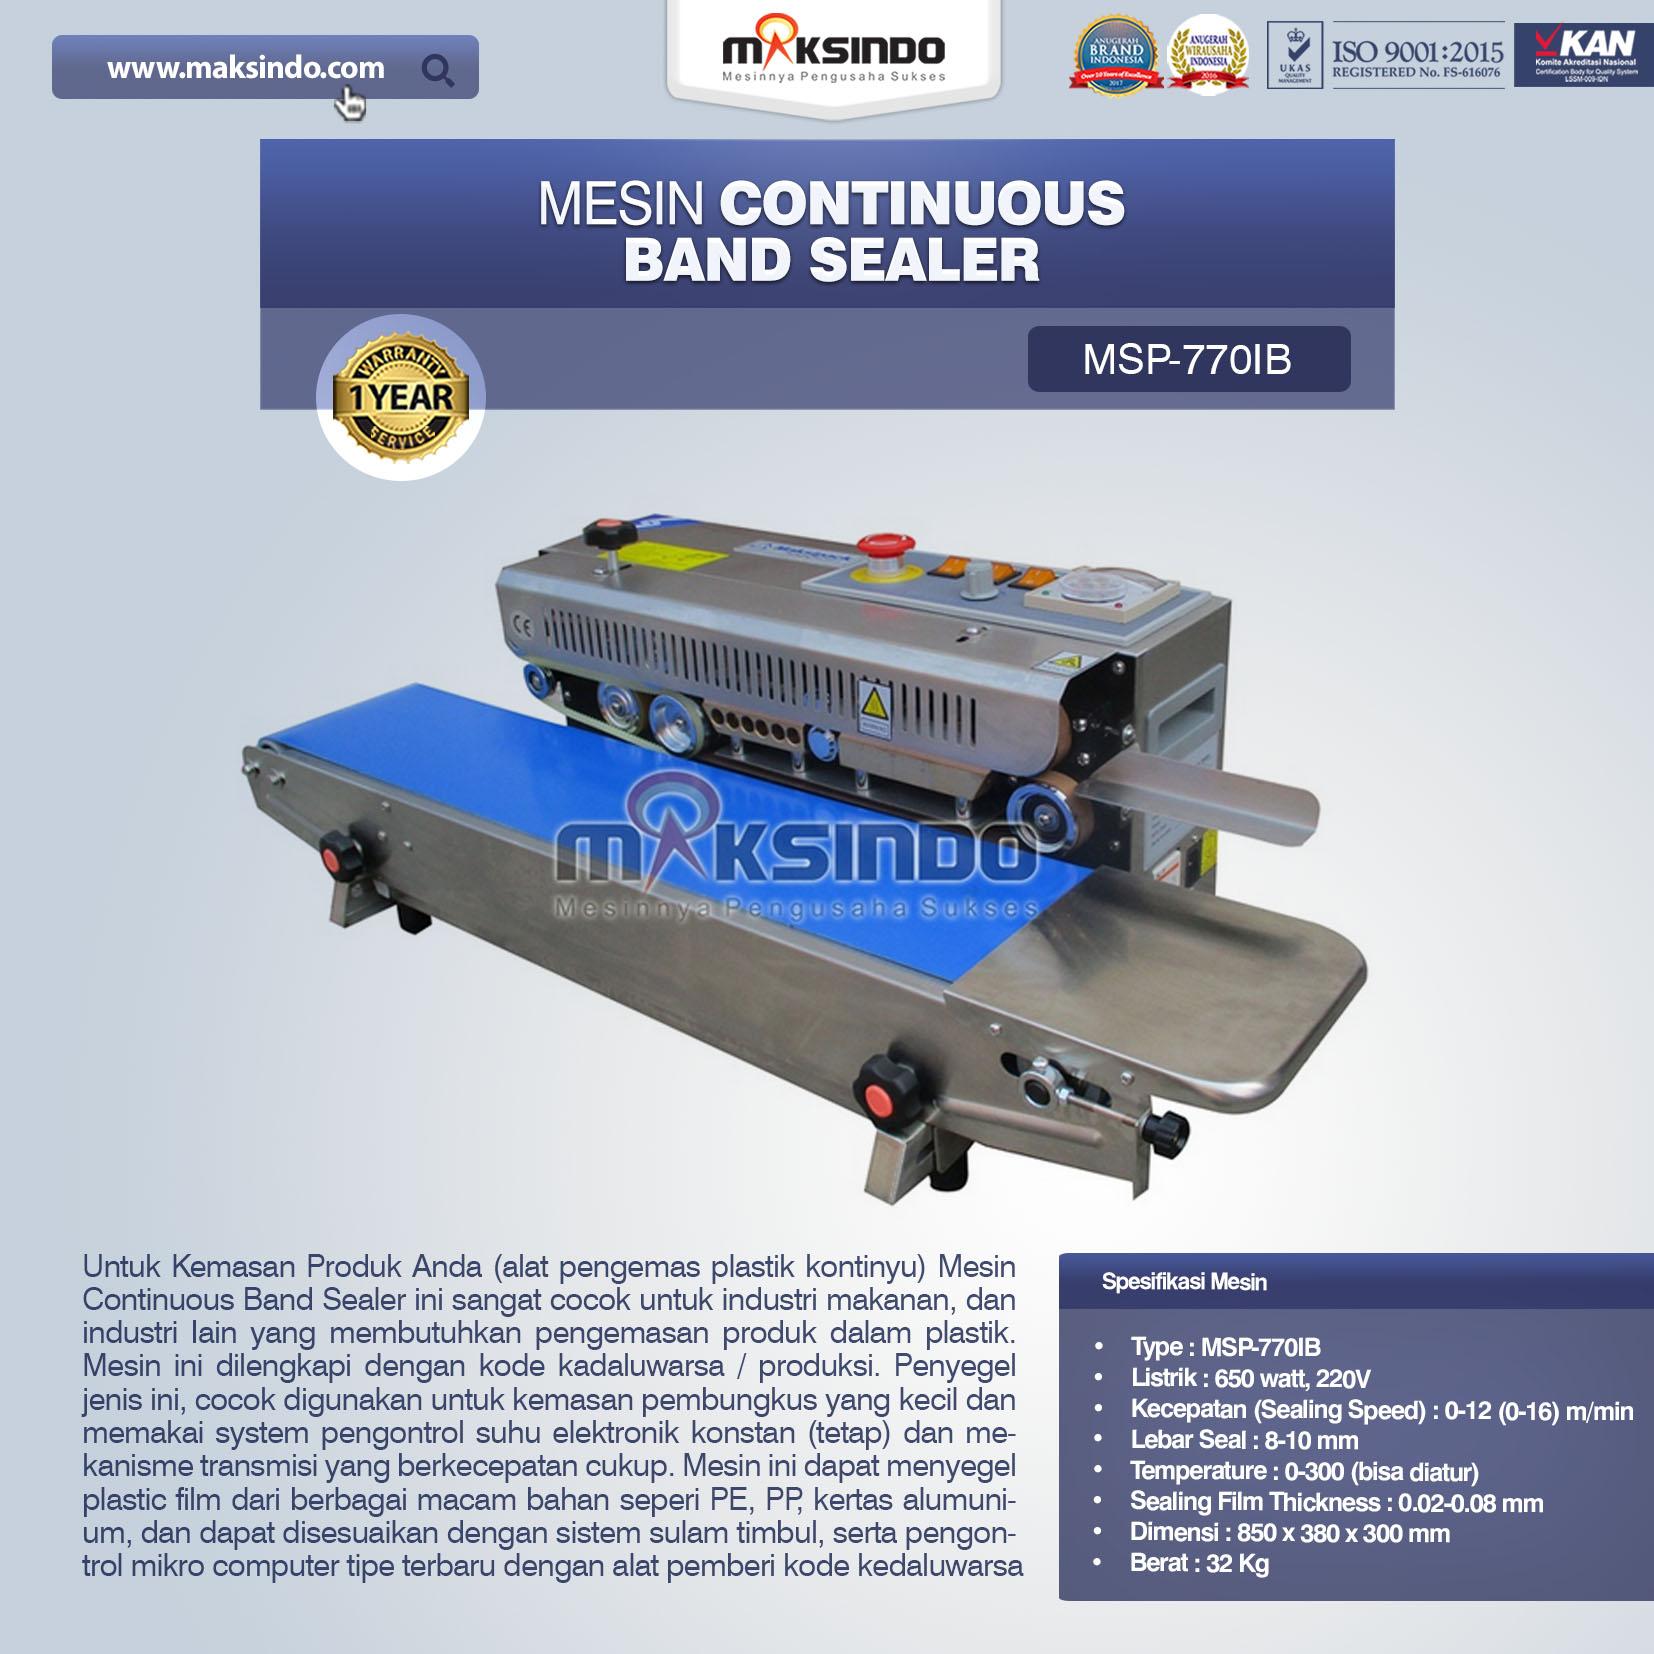 Mesin Continuous Band Sealer MSP-7701B